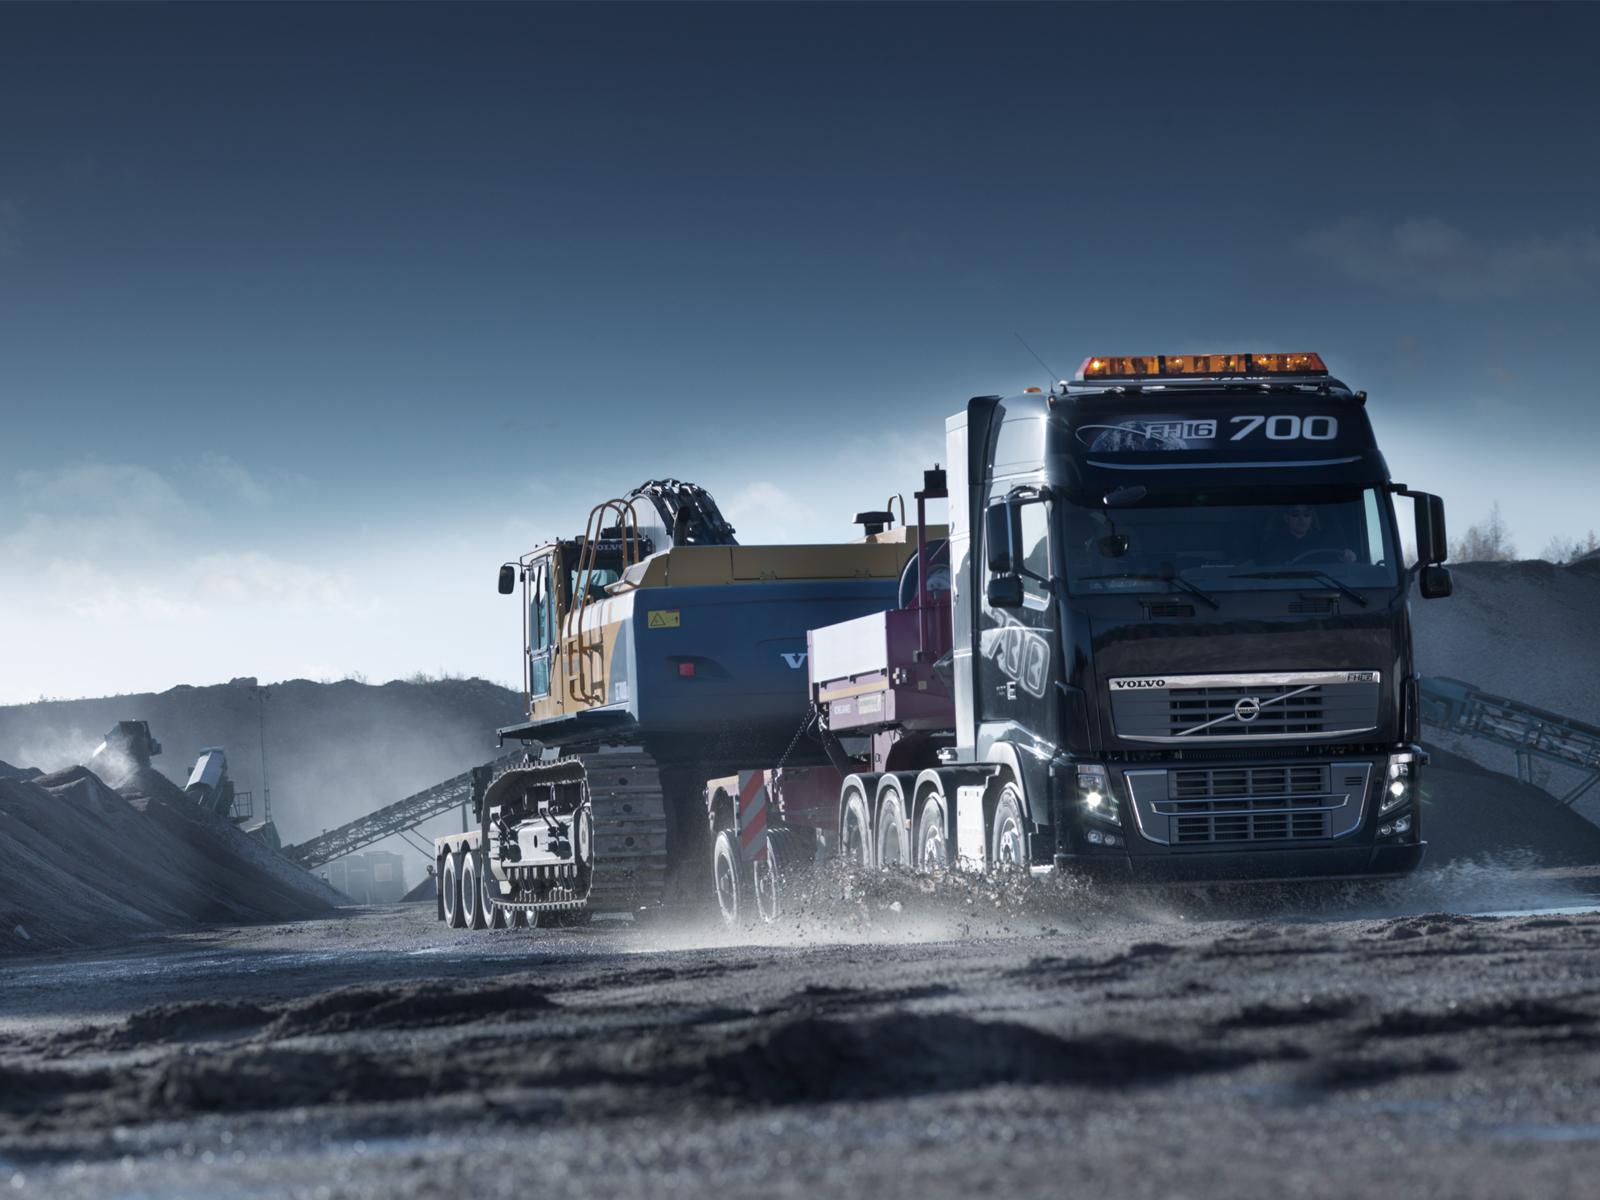 FH16 700 Volvo Truck Desktop Wallpaper 1600x1200